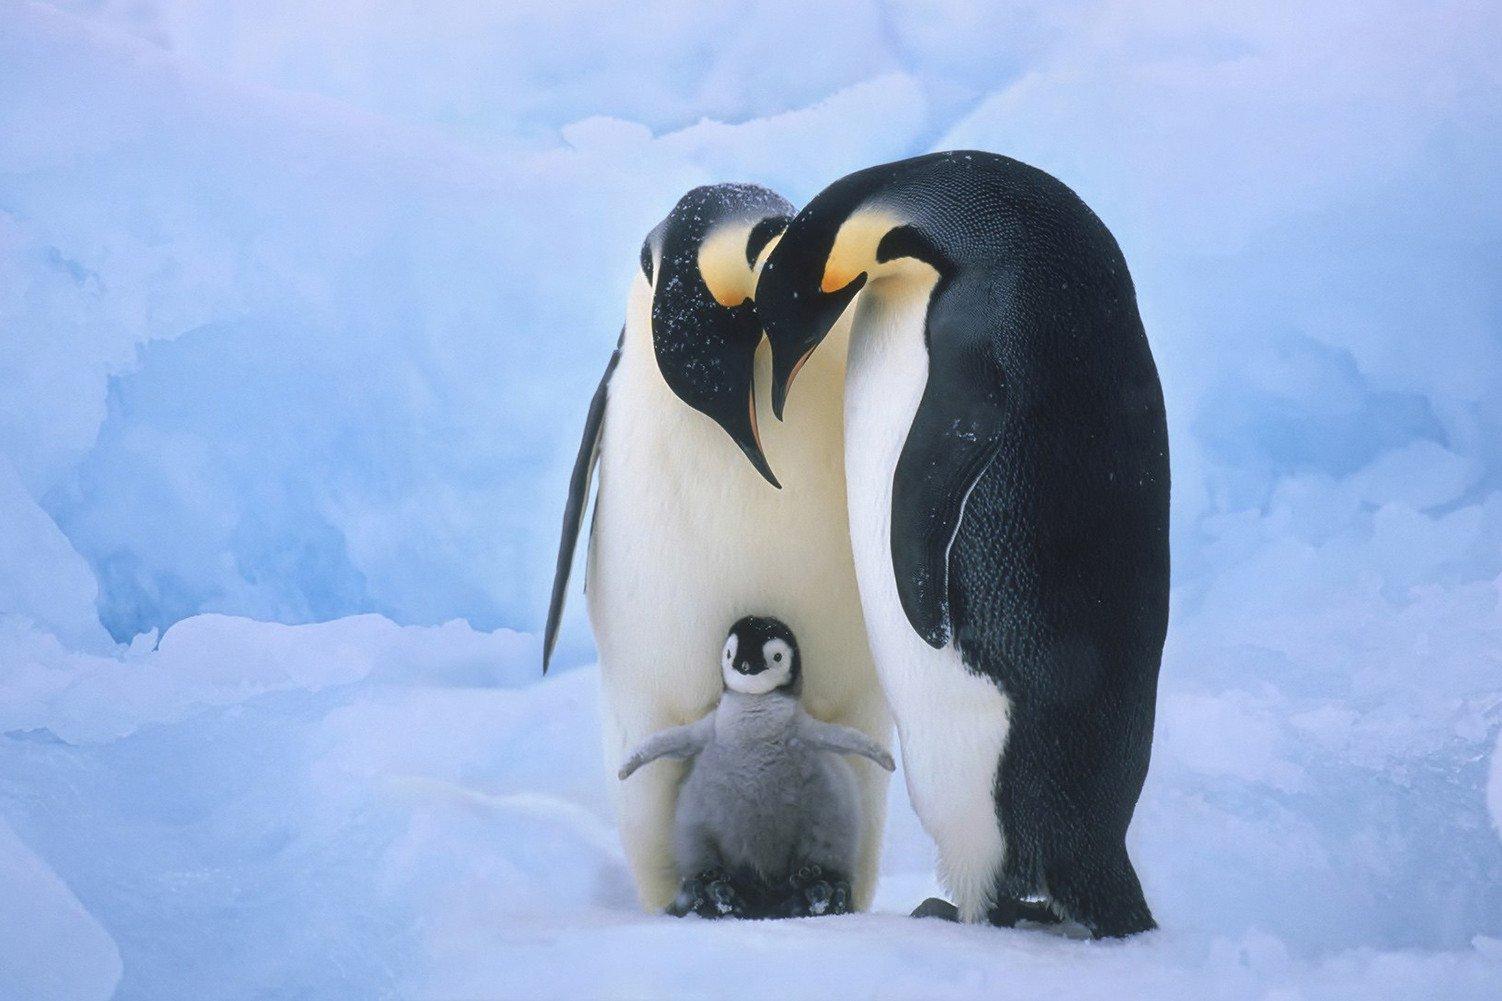 CHOIS Custom Films CF3310 Animal Penguins family Glass Window Decor DIY Stickers 4' W by 3' H